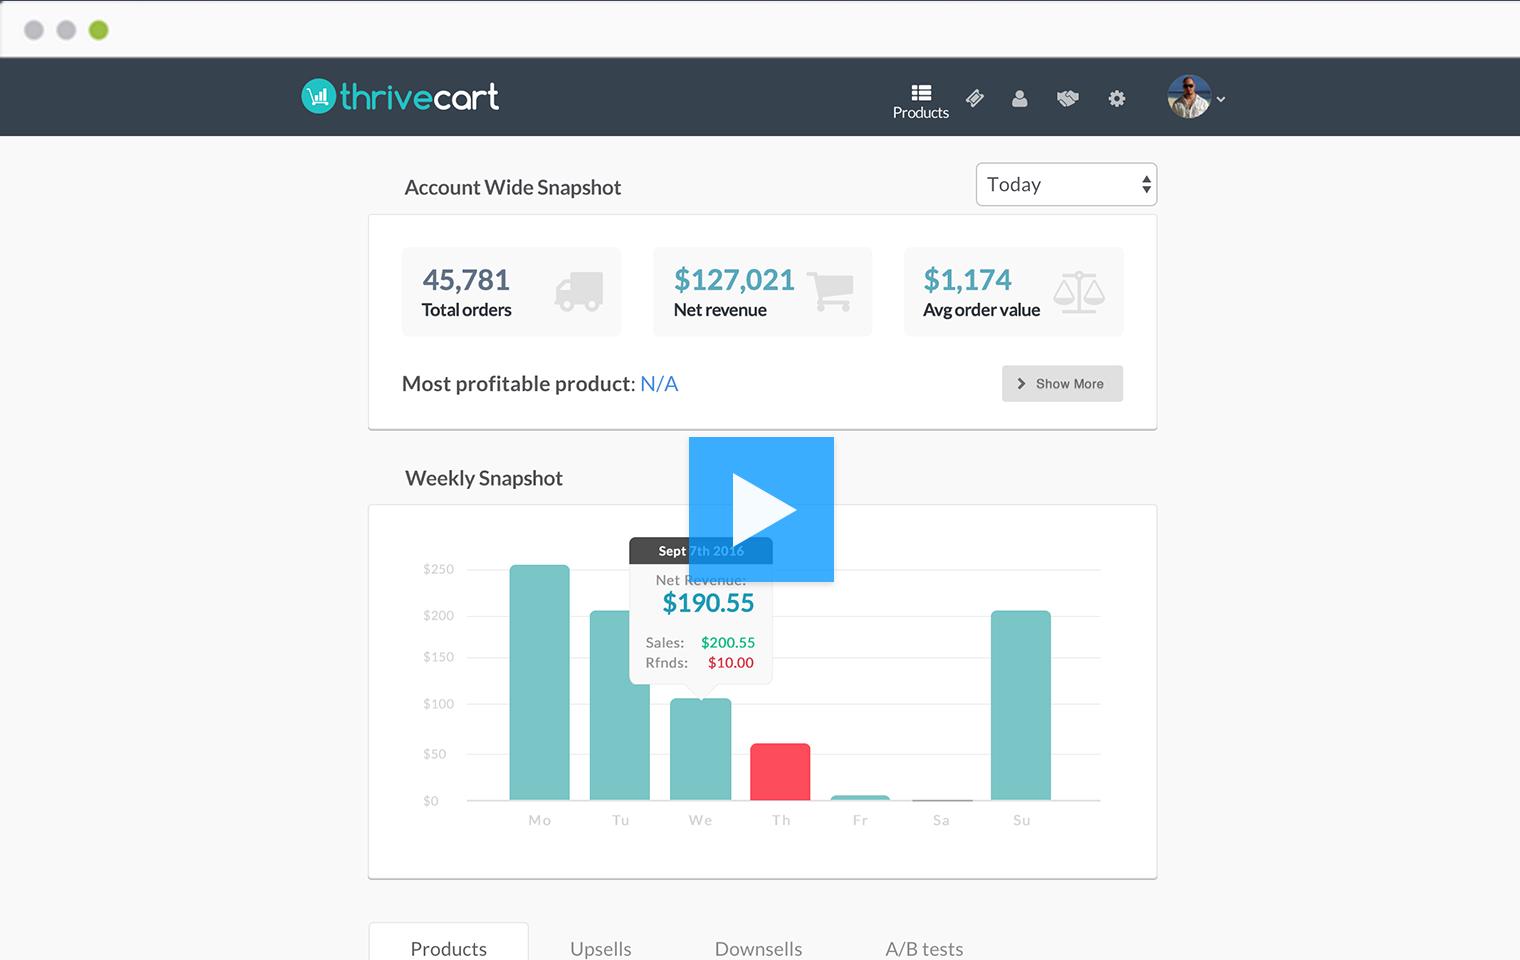 account wide snapshot dashboard